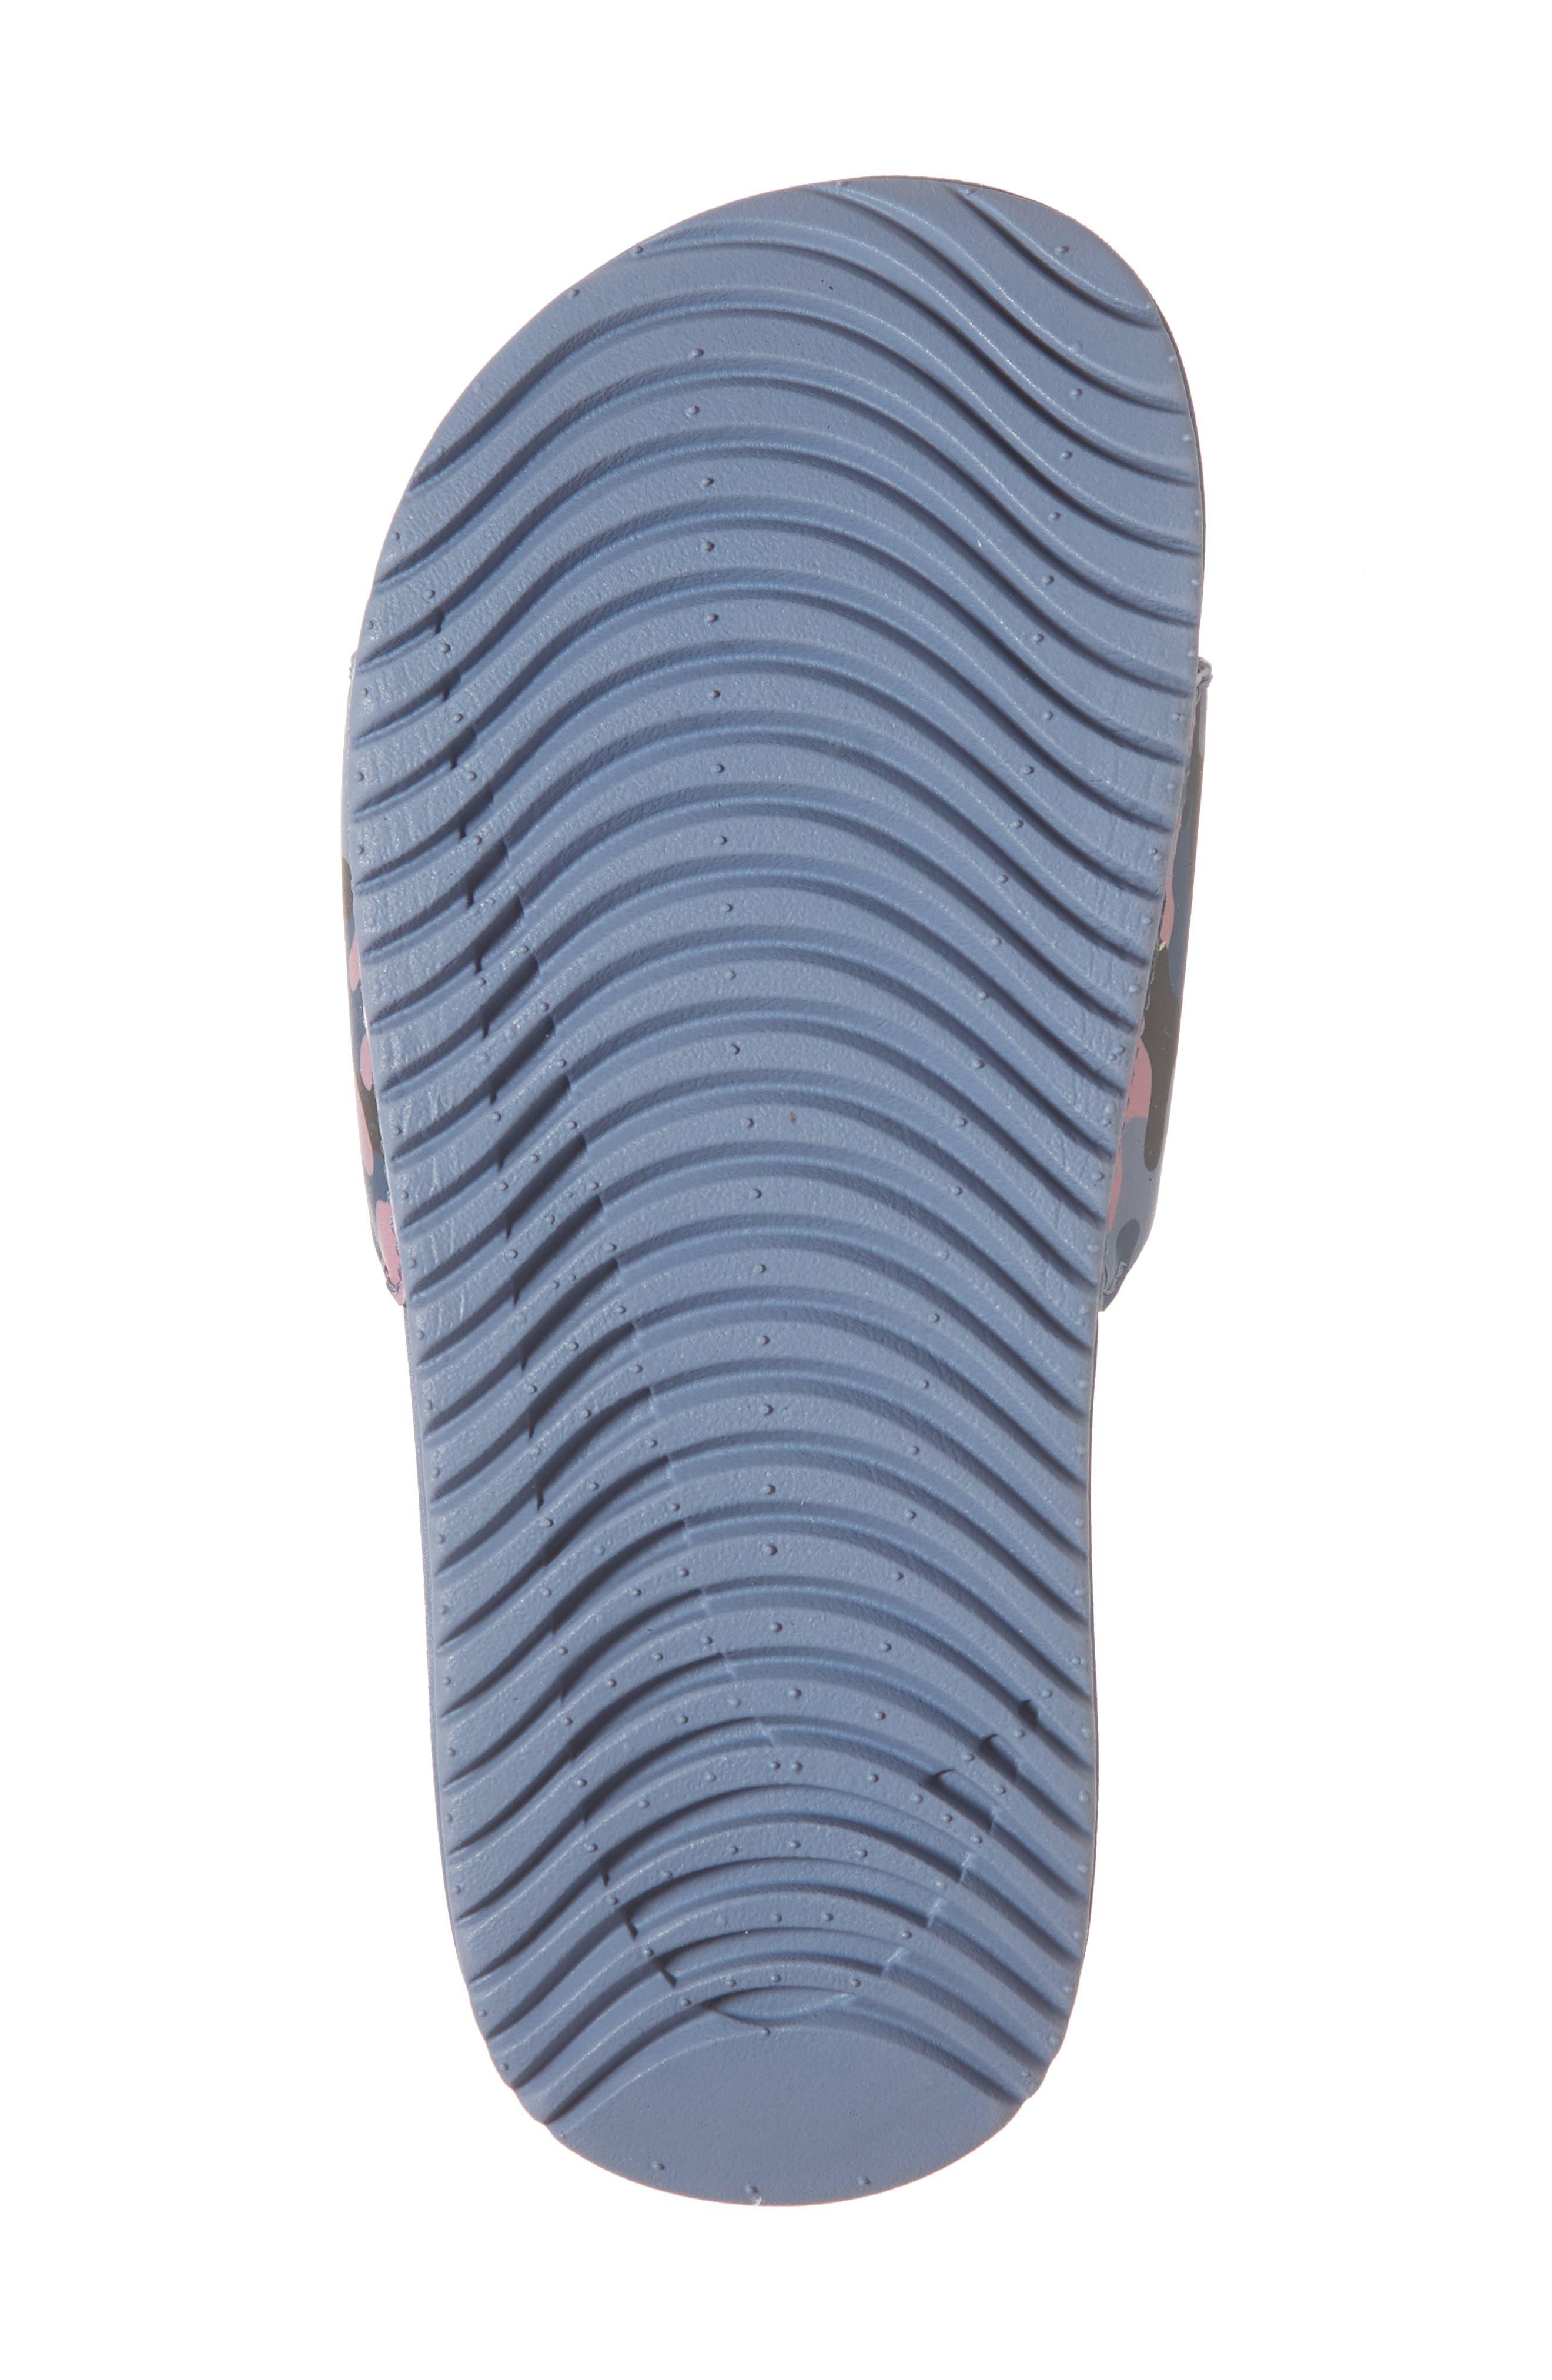 Kawa Slide Sandal,                             Alternate thumbnail 6, color,                             SLATE/ ROSE/ DIFFUSED BLUE